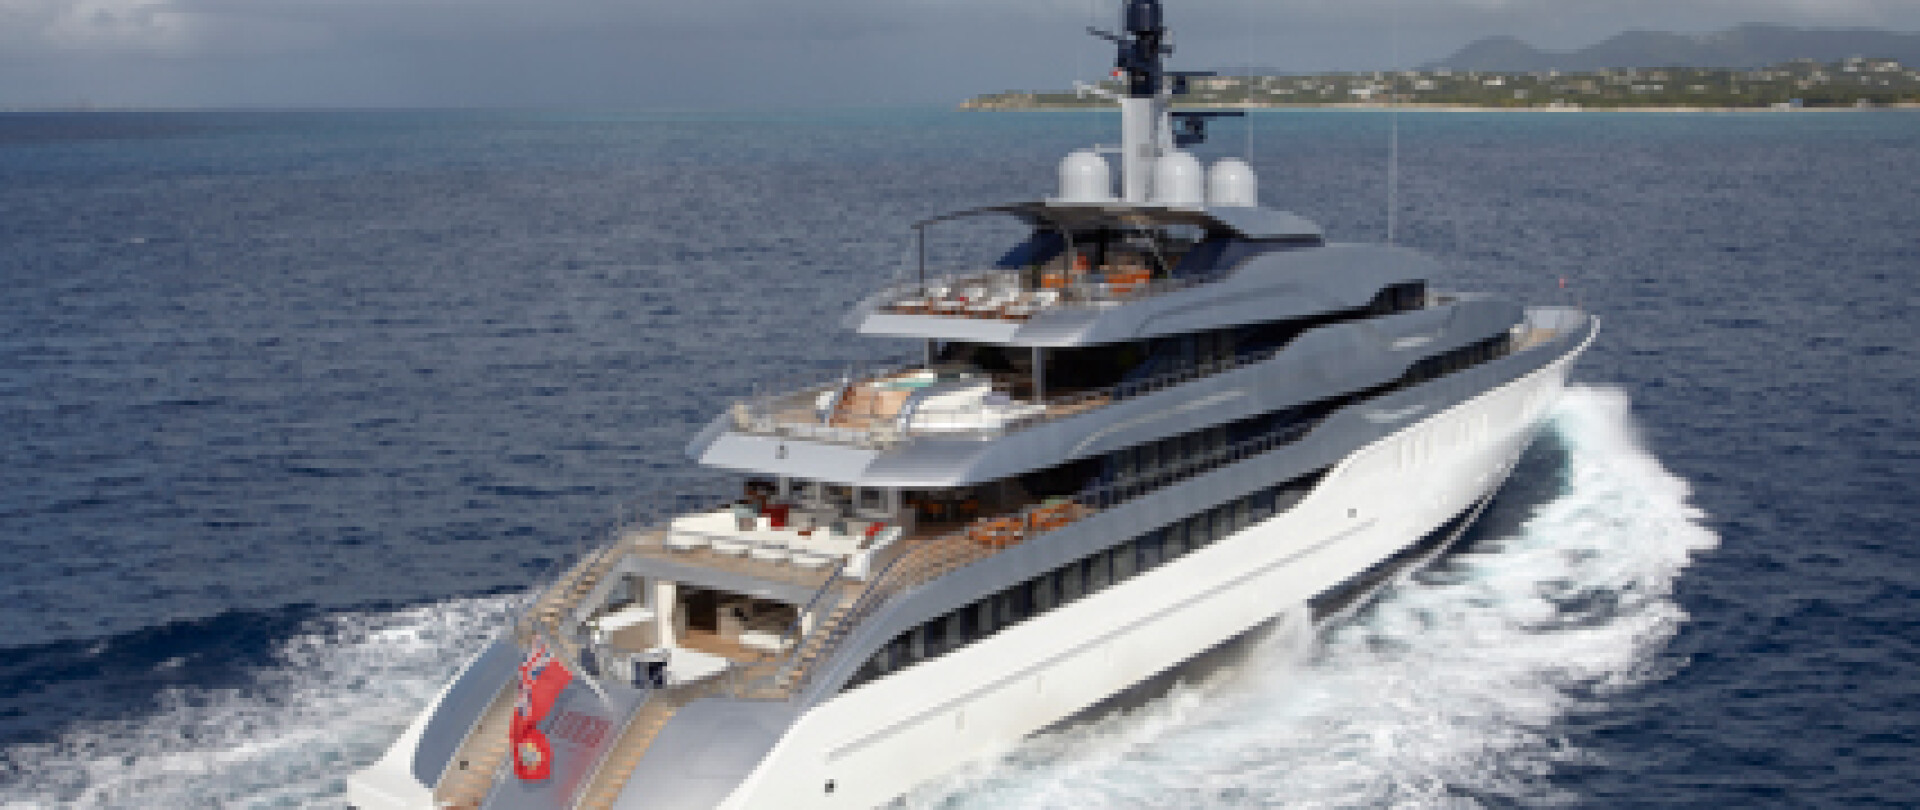 M/Y TANGO wins Motor yacht of the year award photo 2